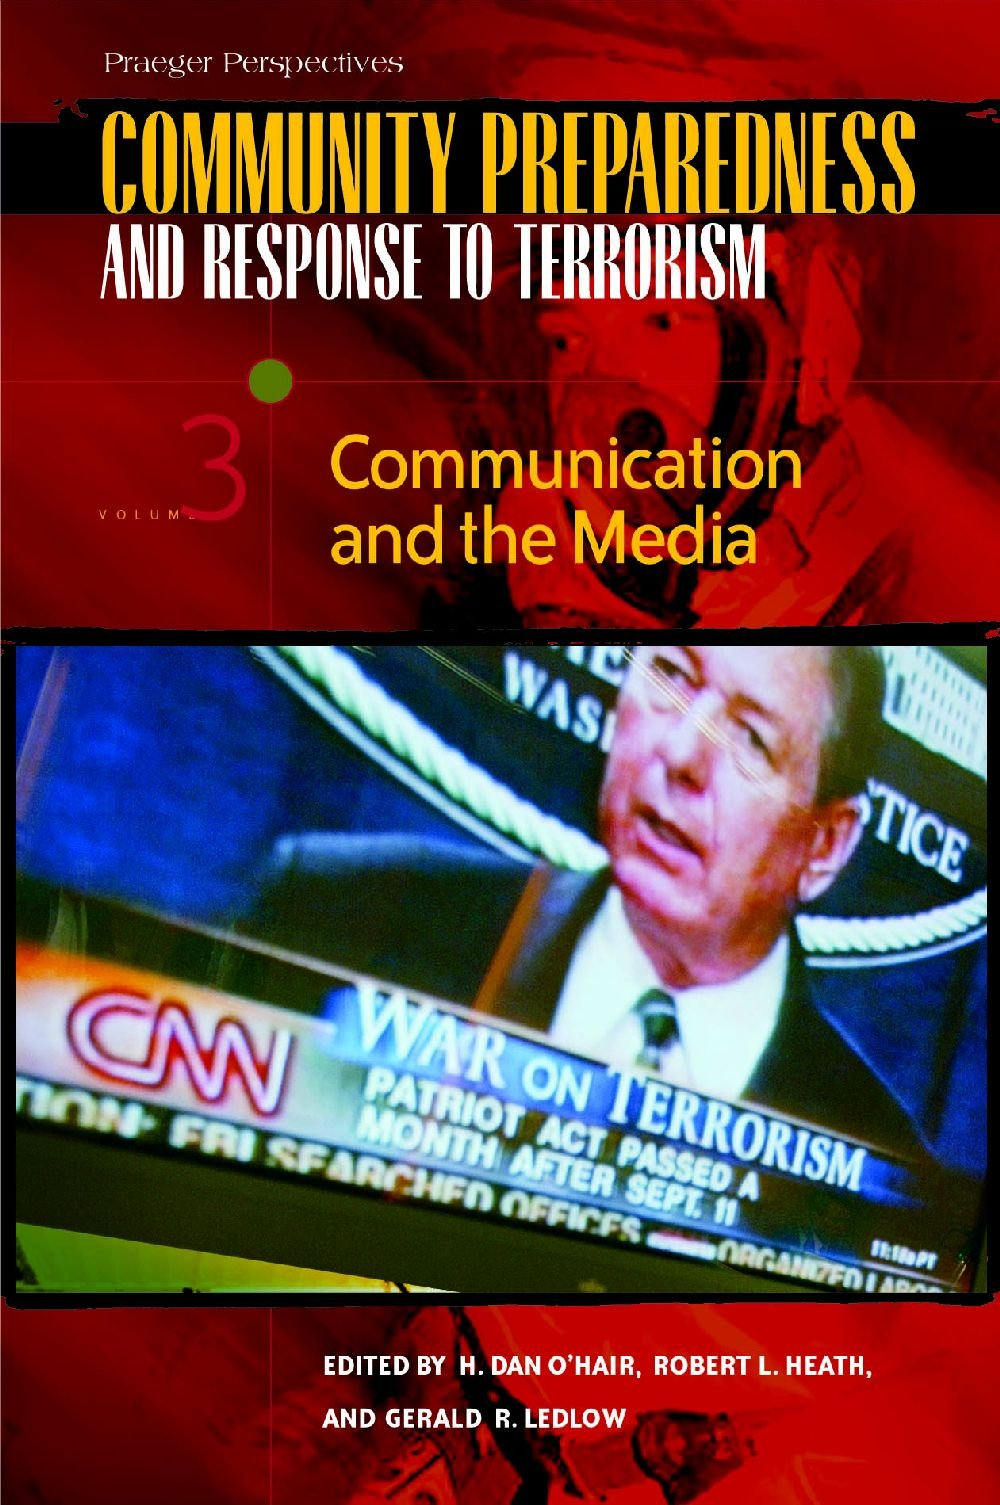 Download Community Preparedness and Response to Terrorism [3 volumes]: [Three Volumes] PDF